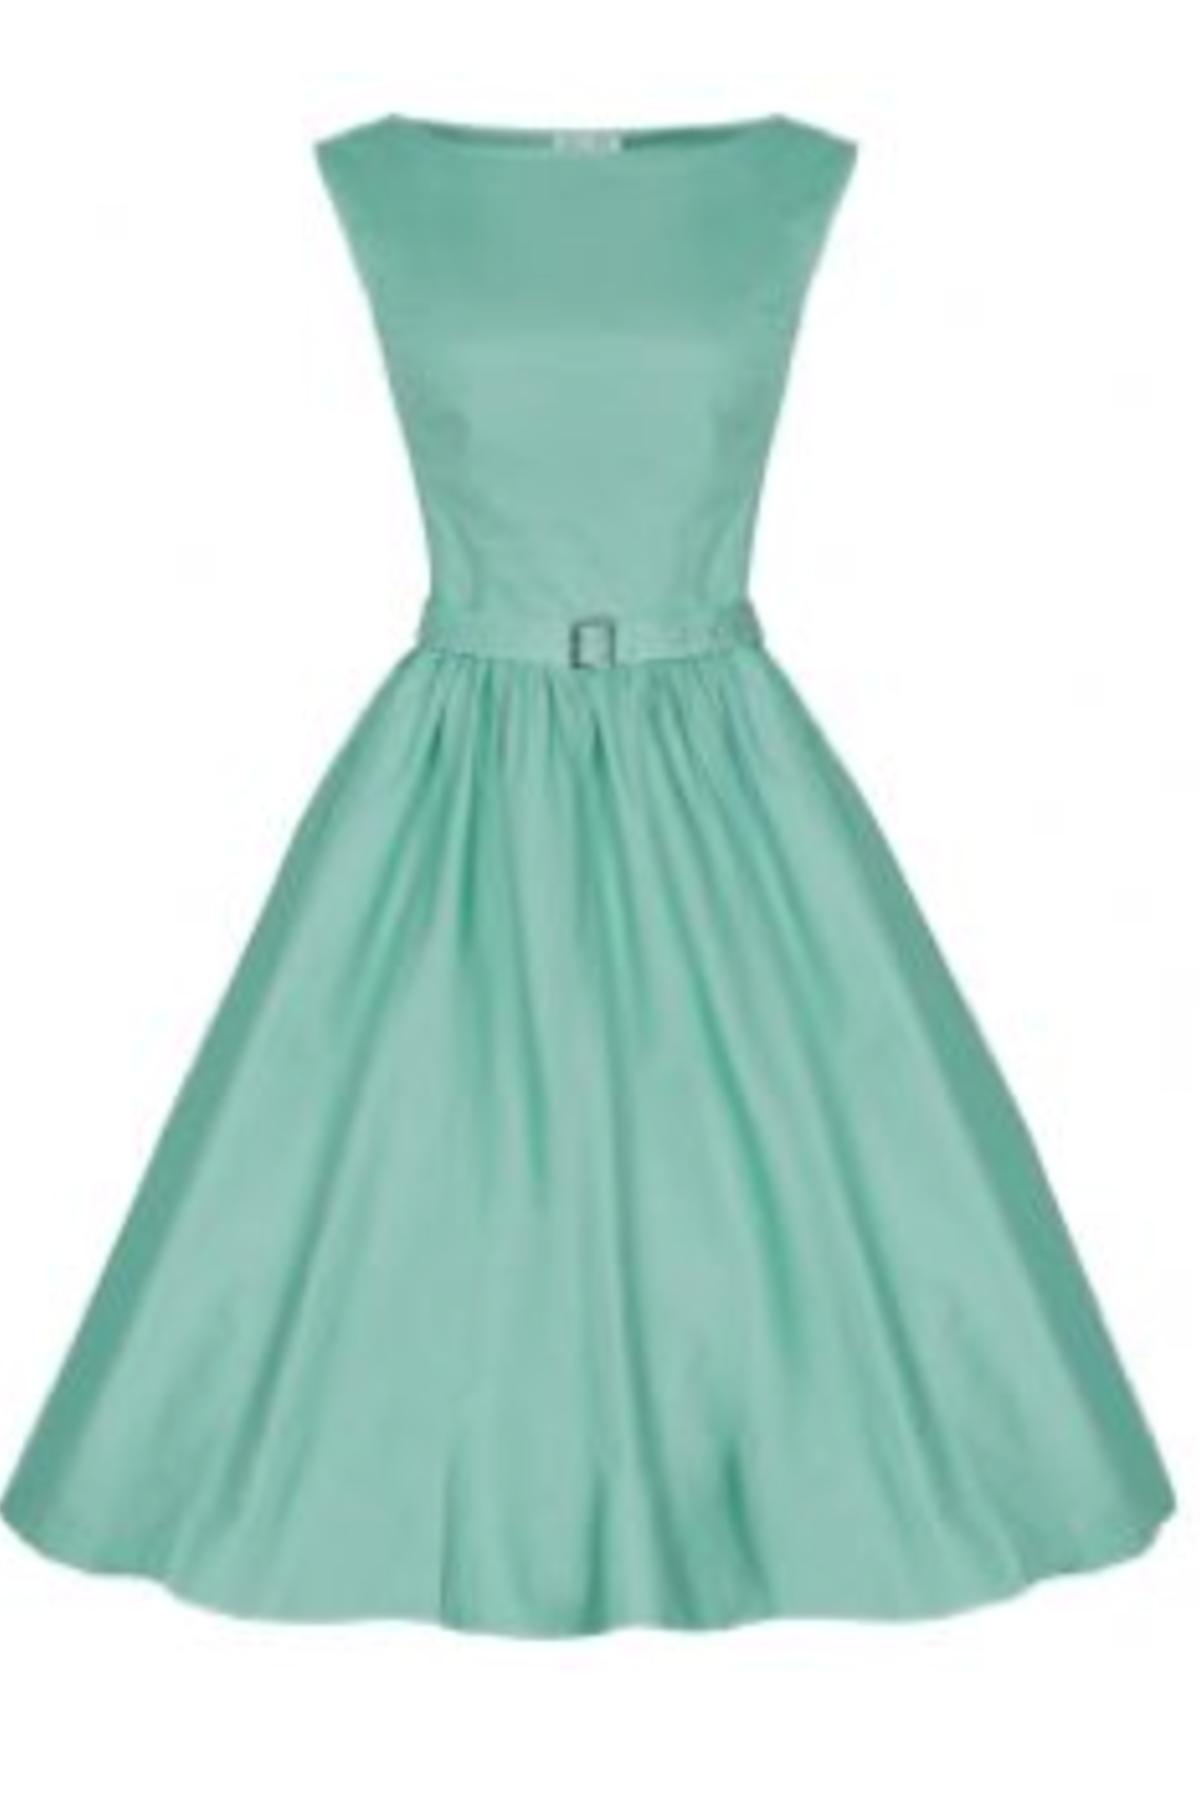 pretty dress | Analysis: Pann | Pinterest | Audrey hepburn style ...